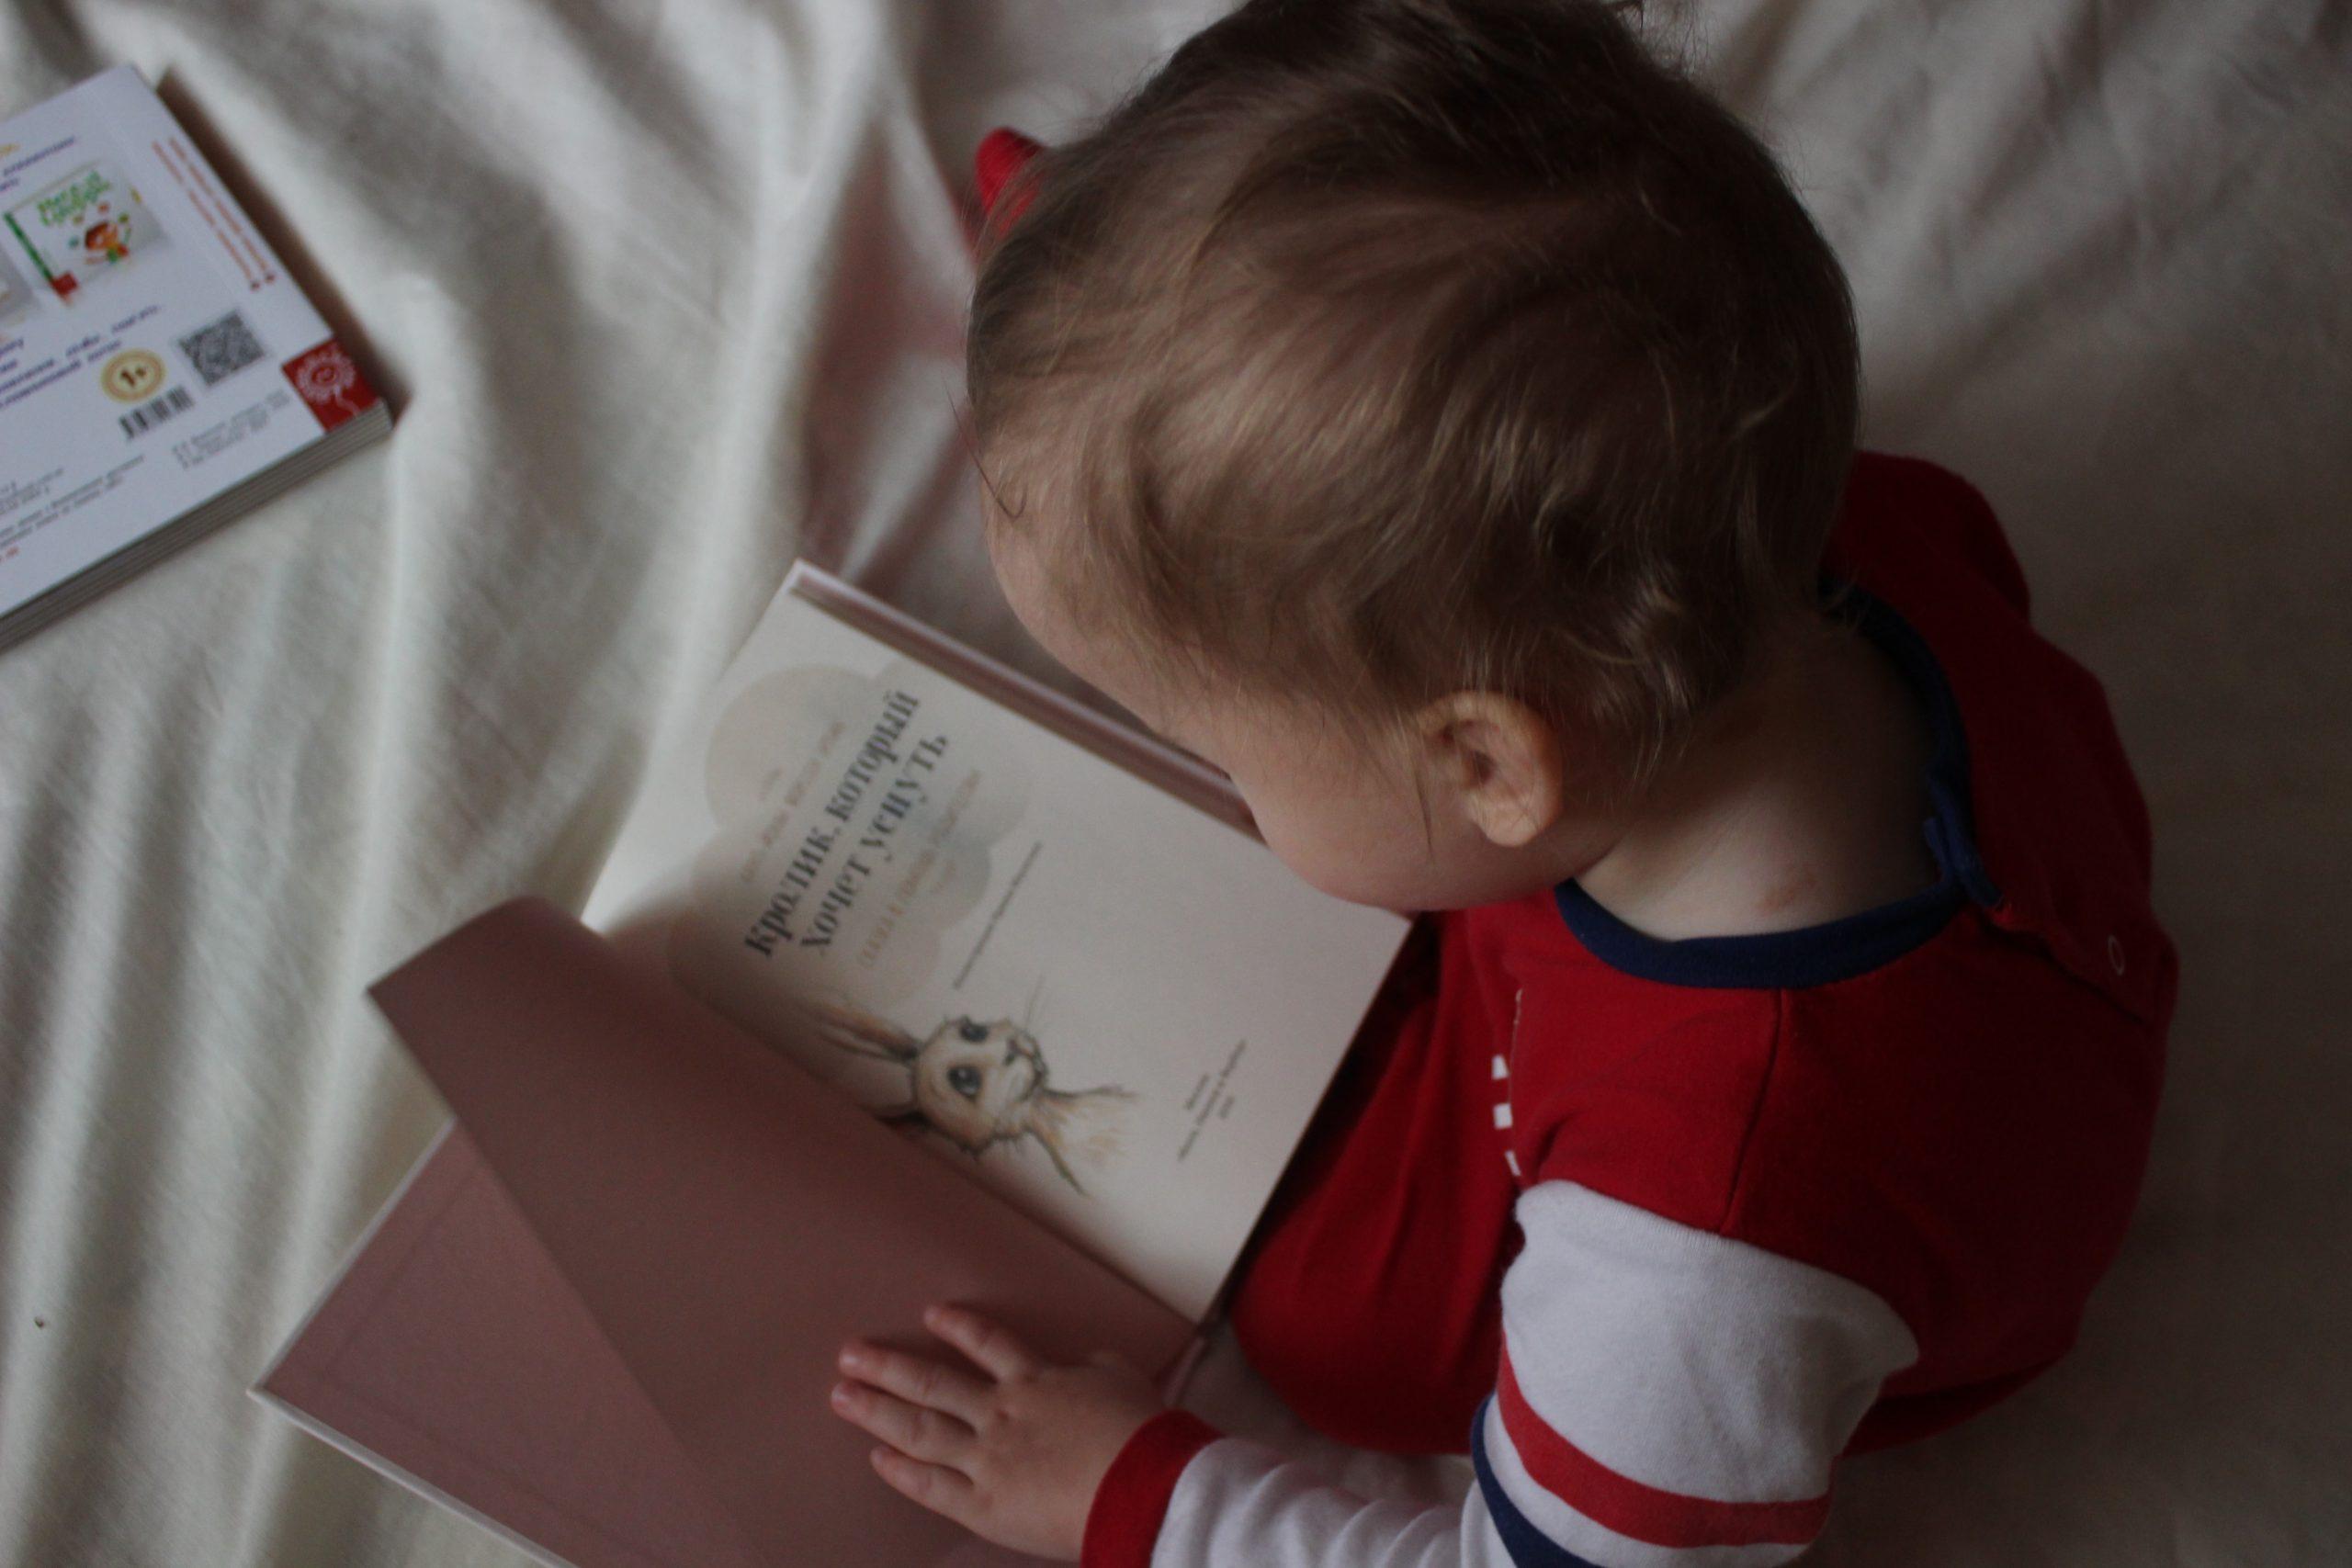 Libri per bambini da regalare a Natale 2011 - https://unsplash.com/photos/XUX2s1wsFmU?utm_source=unsplash&utm_medium=referral&utm_content=creditShareLink